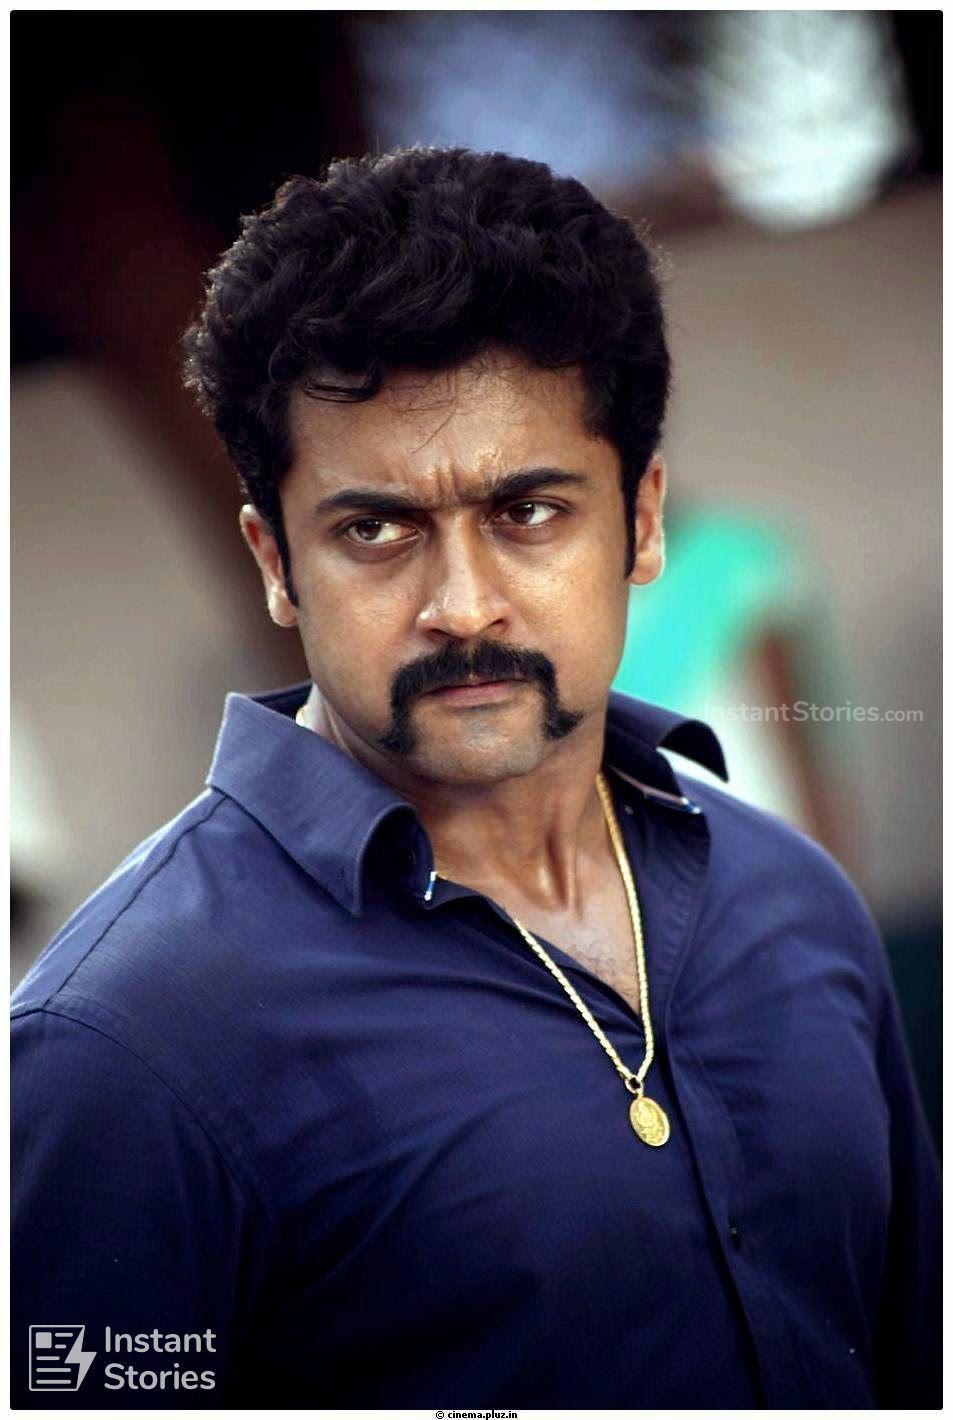 Suriya Latest Hd Photos Wallpapers 1080p 4k 12275 Suriya Surya Actor Actor Photo Hd Photos